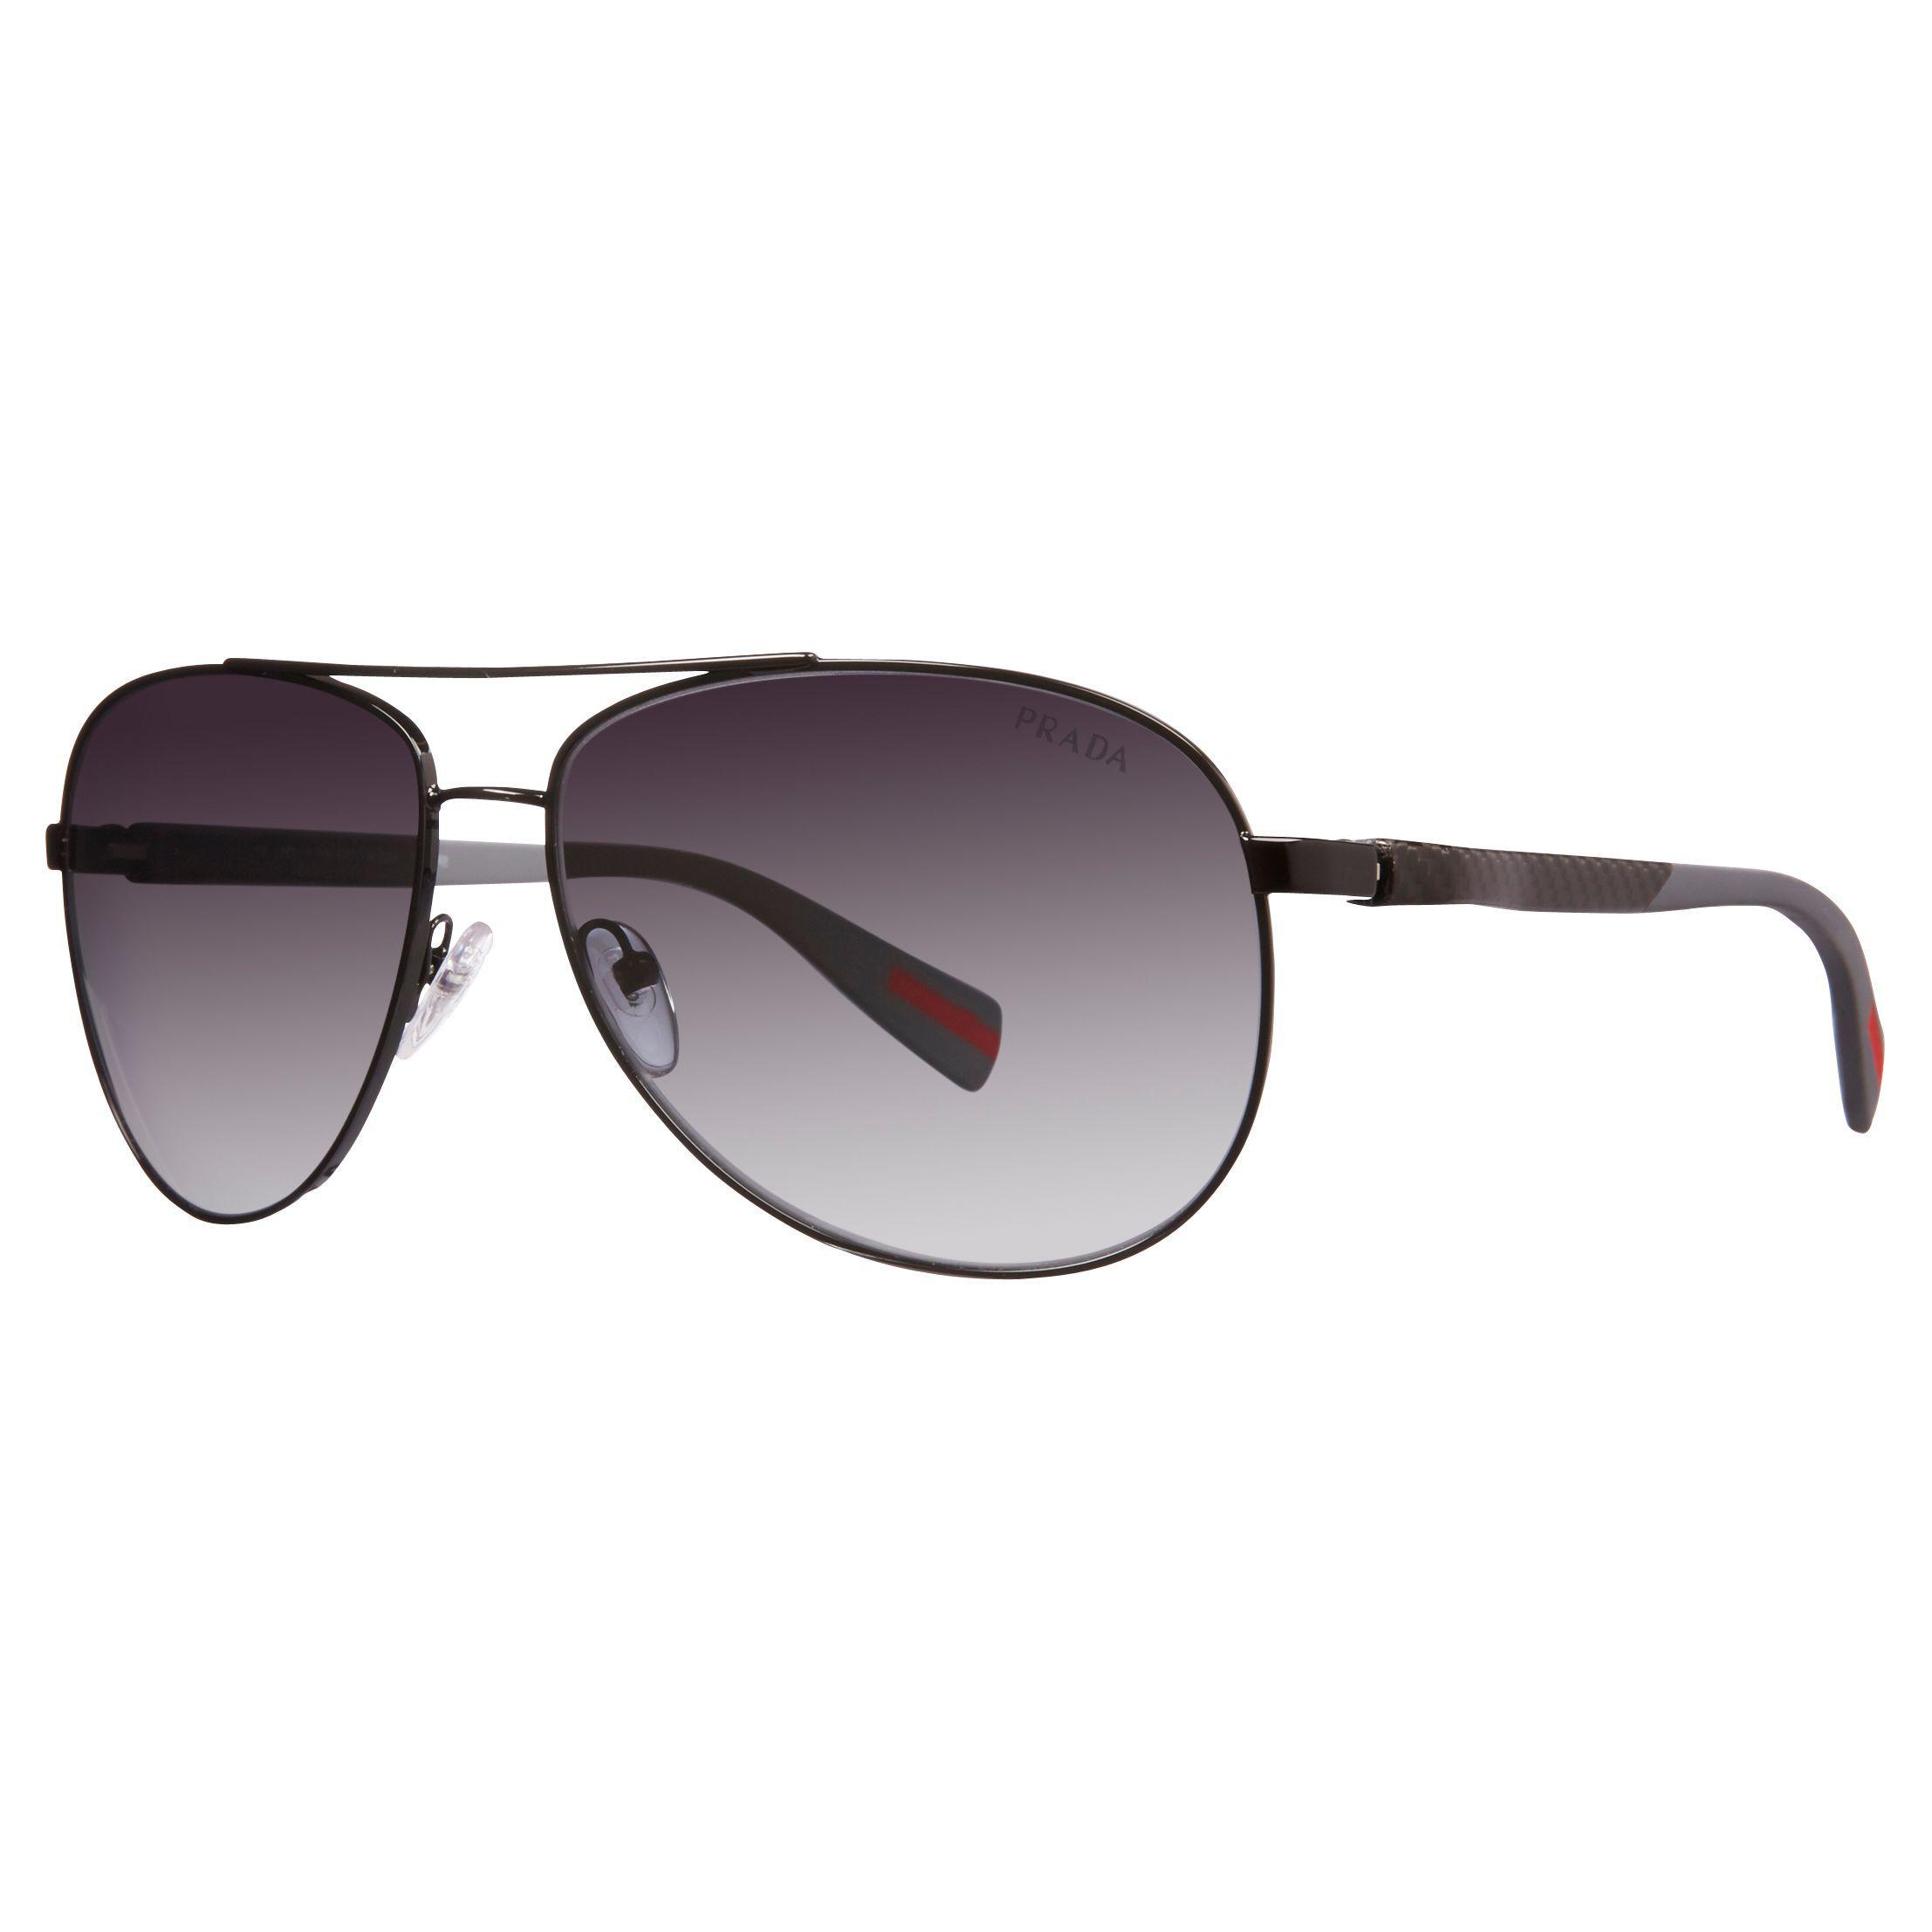 1b67b1edd539 Prada Ps51os 7ax5w1 Polarised Aviator Sunglasses in Black for Men - Lyst